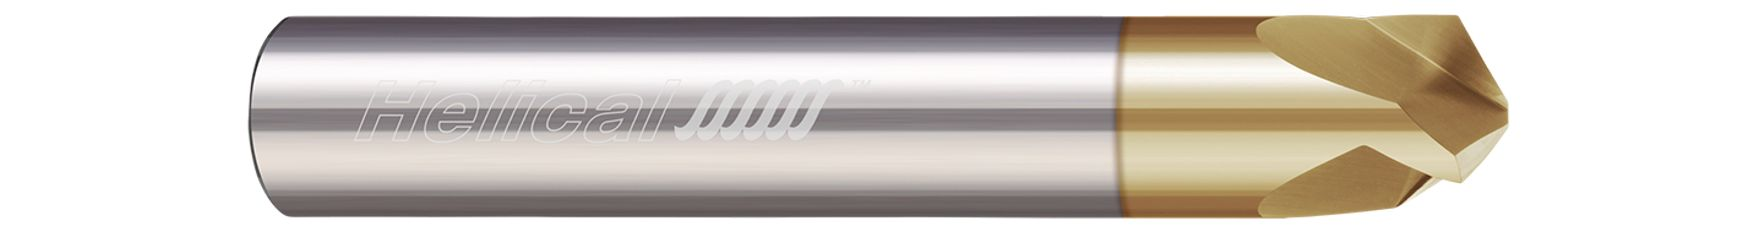 tool-details-59829